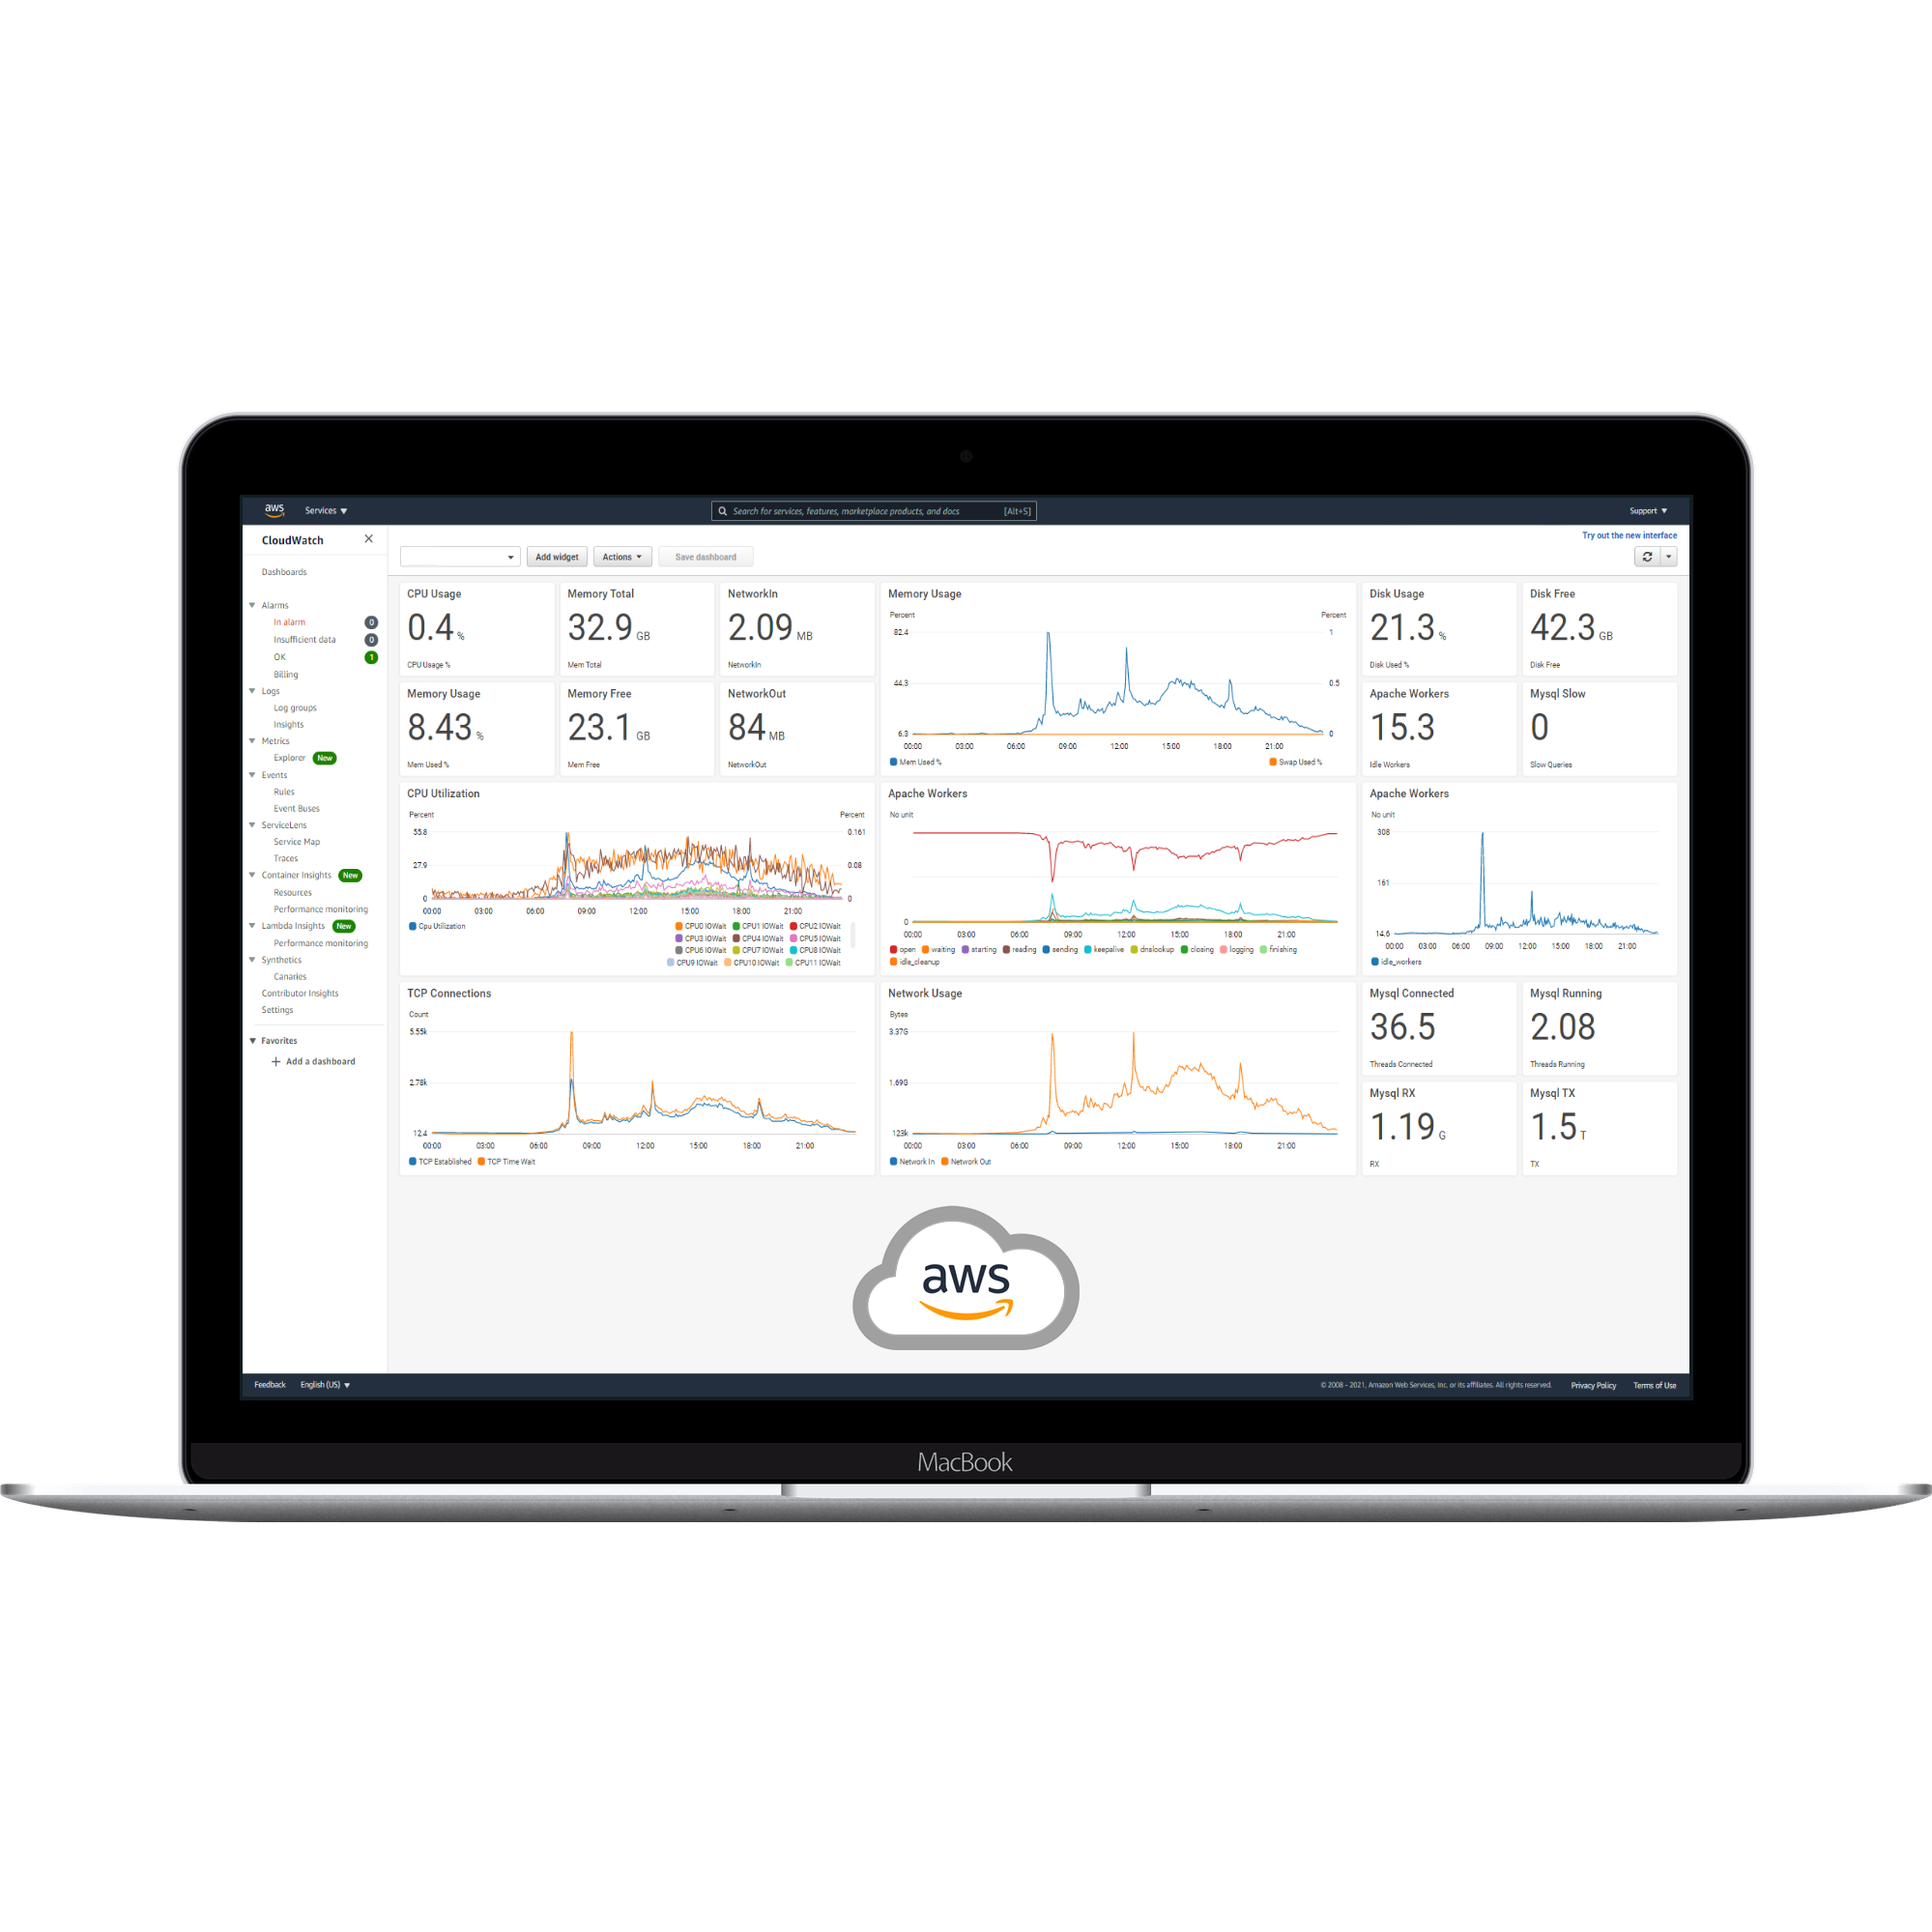 aws-cloudwatch-metrics-devactif-Macbook-3